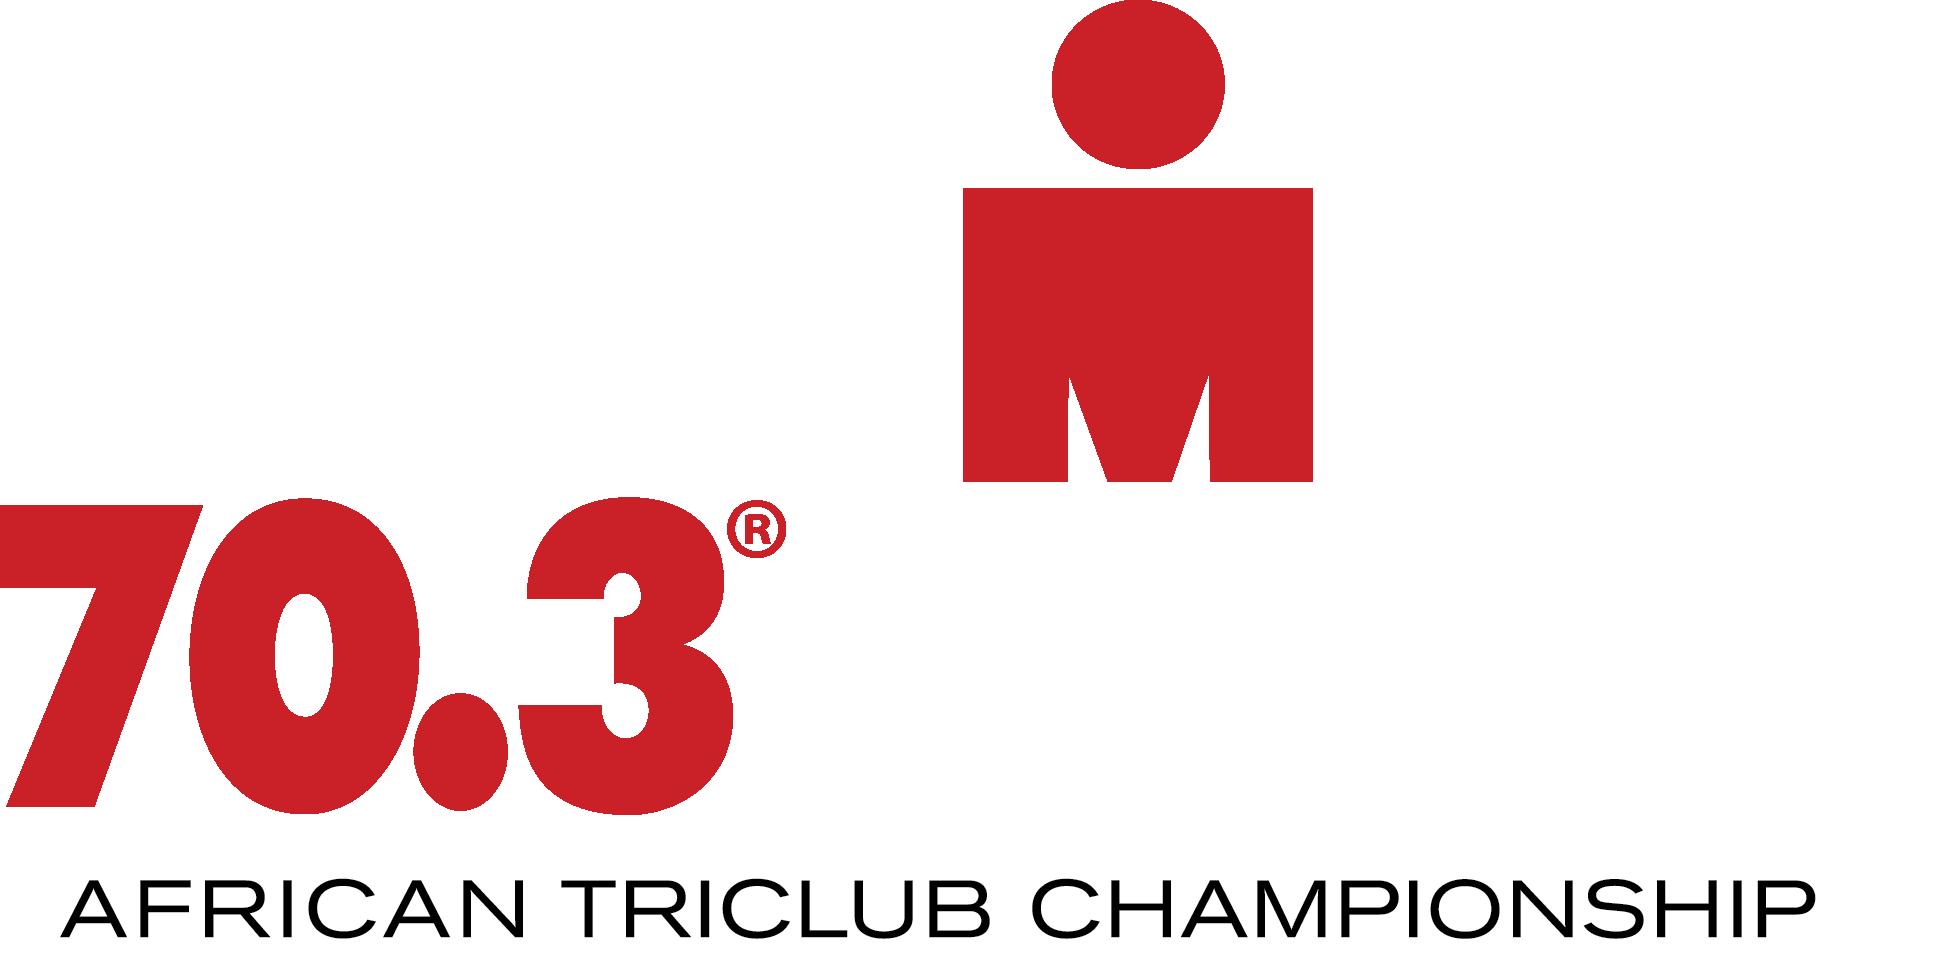 StandardBank_70.3_BuffaloCity_logo_Triclub_championship white logo